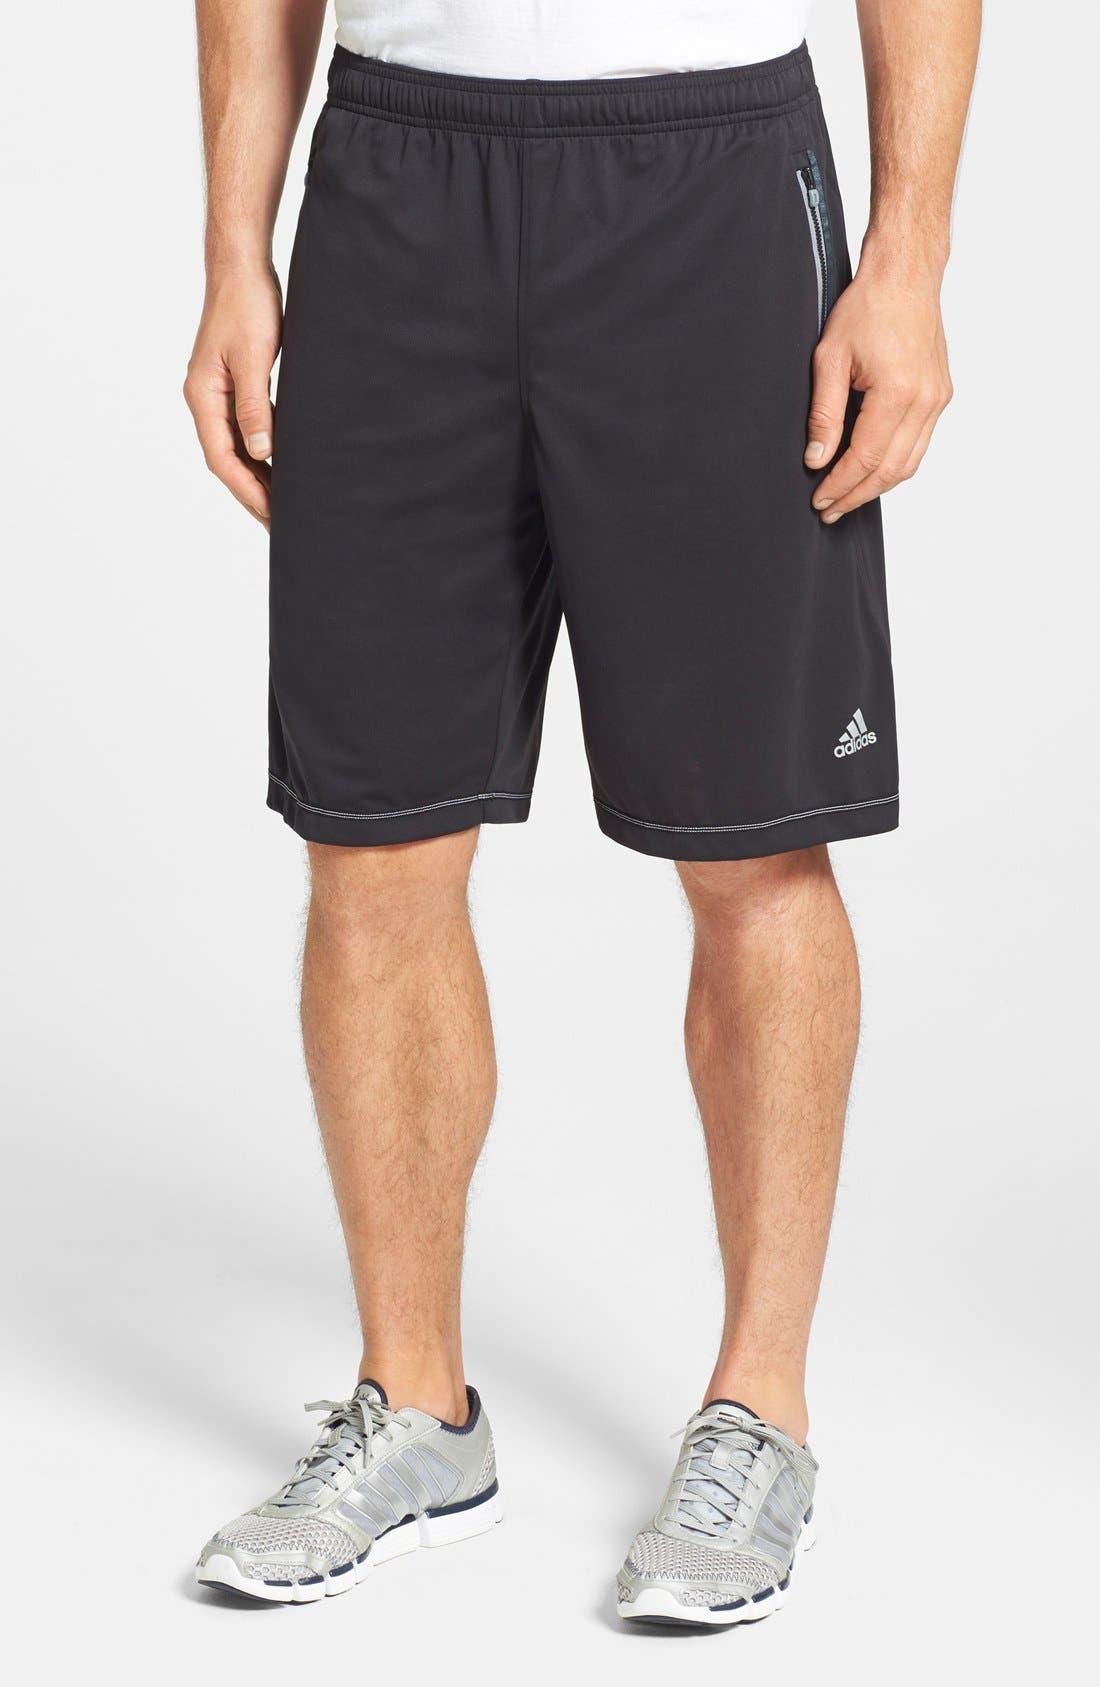 Alternate Image 1 Selected - adidas 'CLIMACHILL™' Athletic Shorts